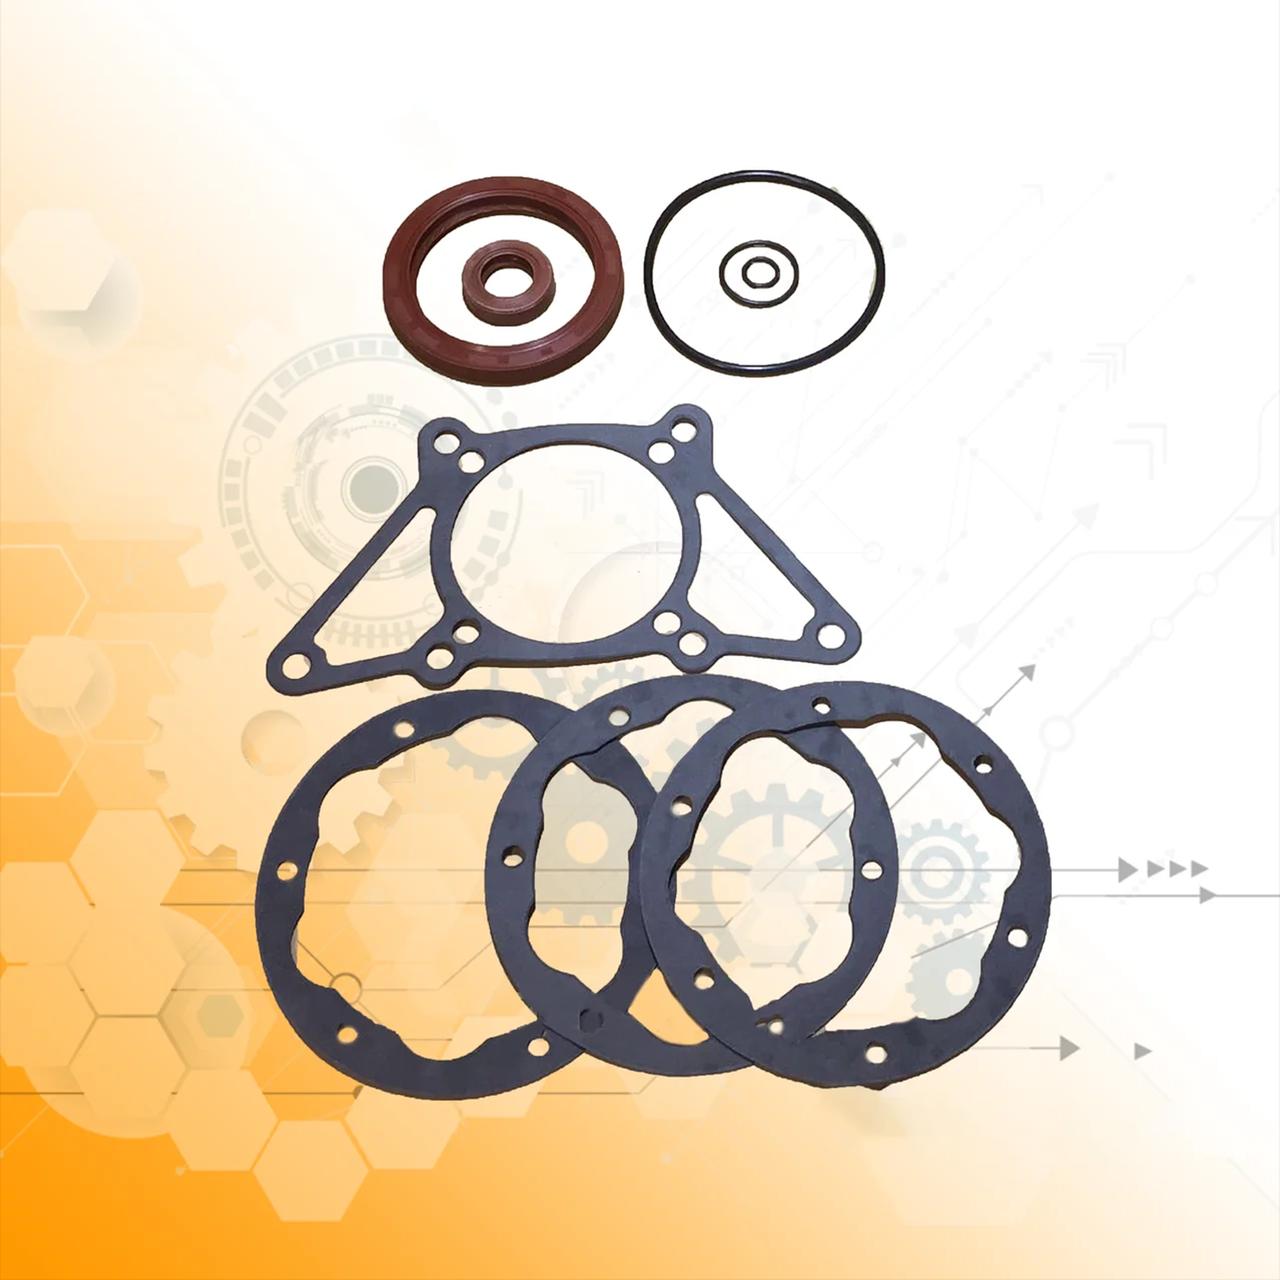 Ремкомплект привода вентилятора ЯМЗ-7511 Евро-2, 3